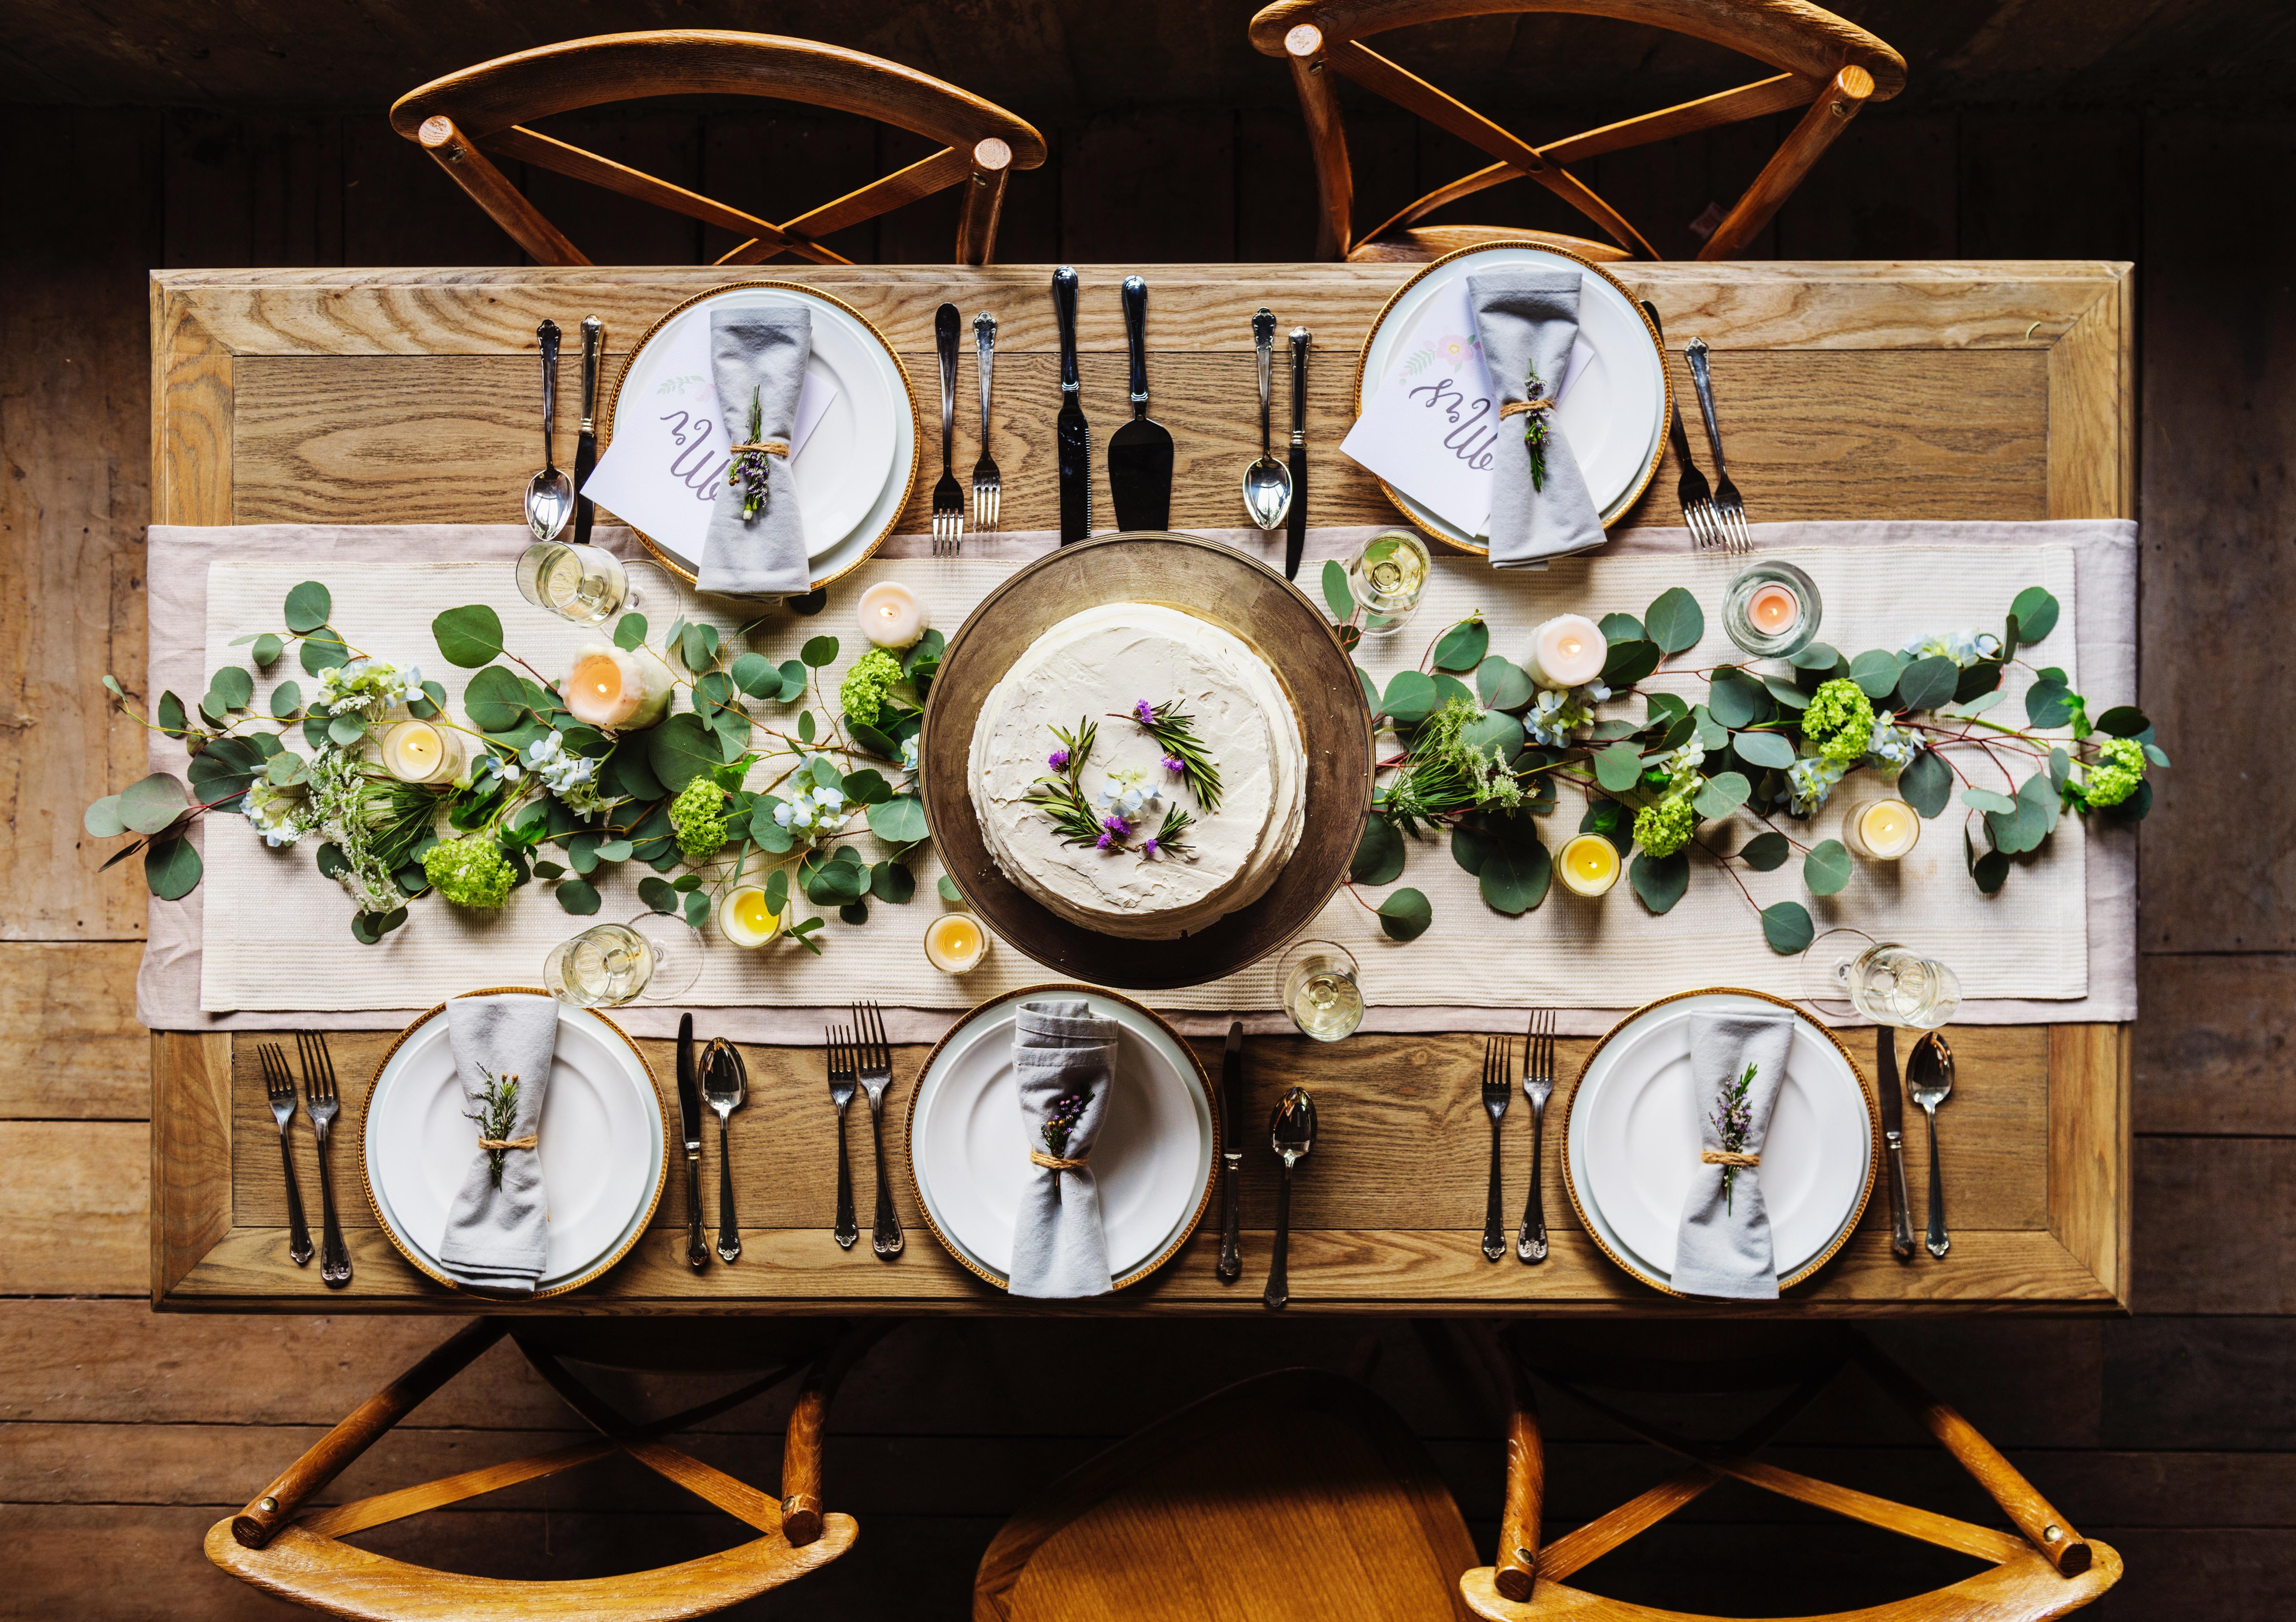 Free Images : table, clock, furniture, decor, overhead, flatlay ...